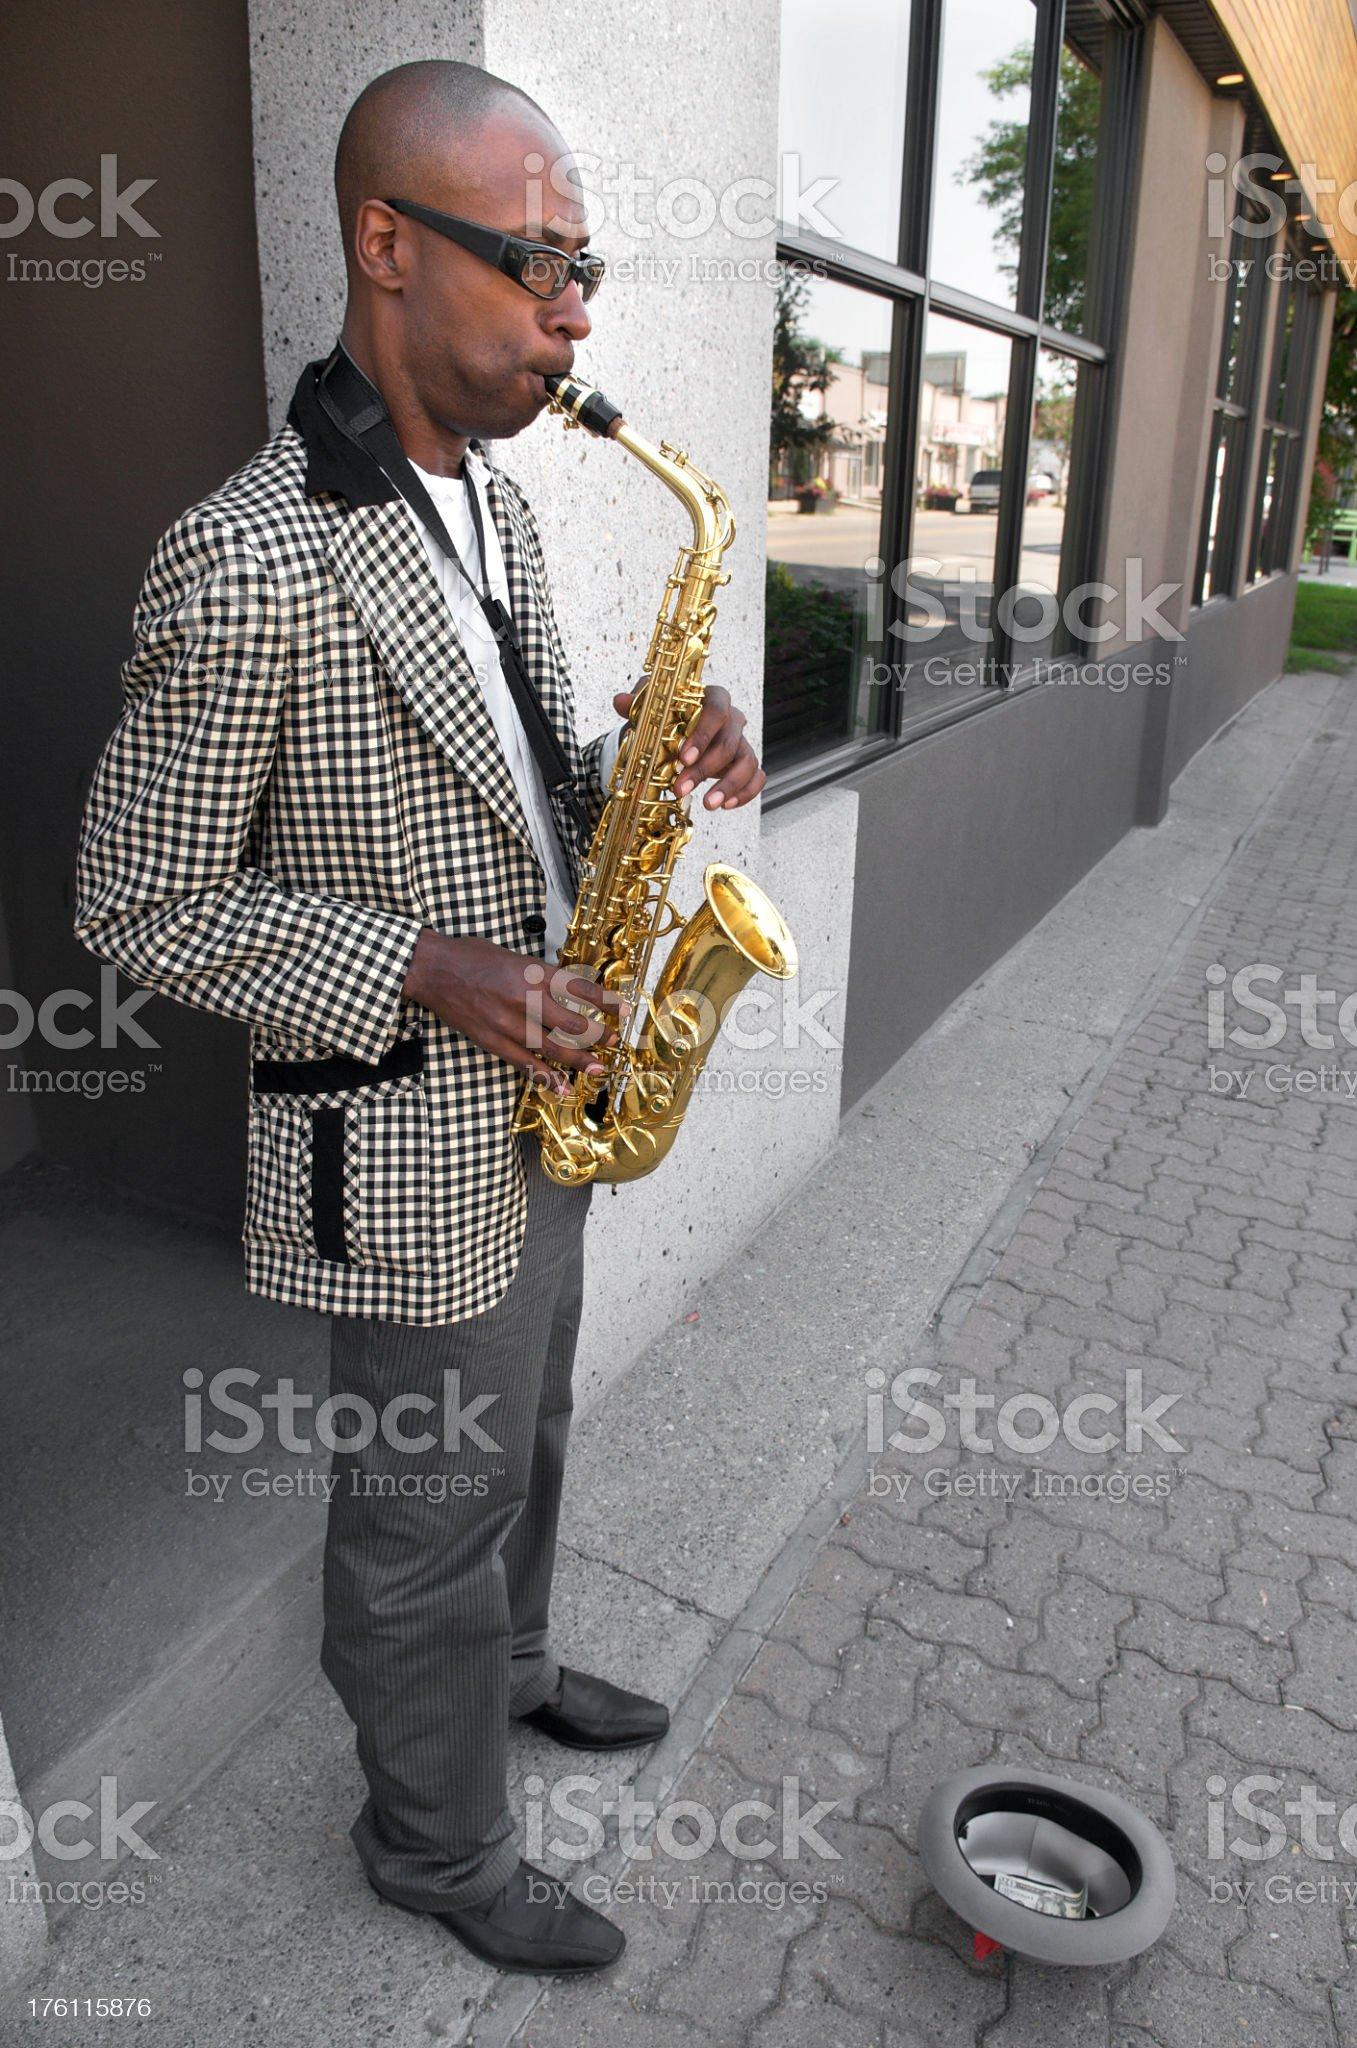 Street Musician royalty-free stock photo